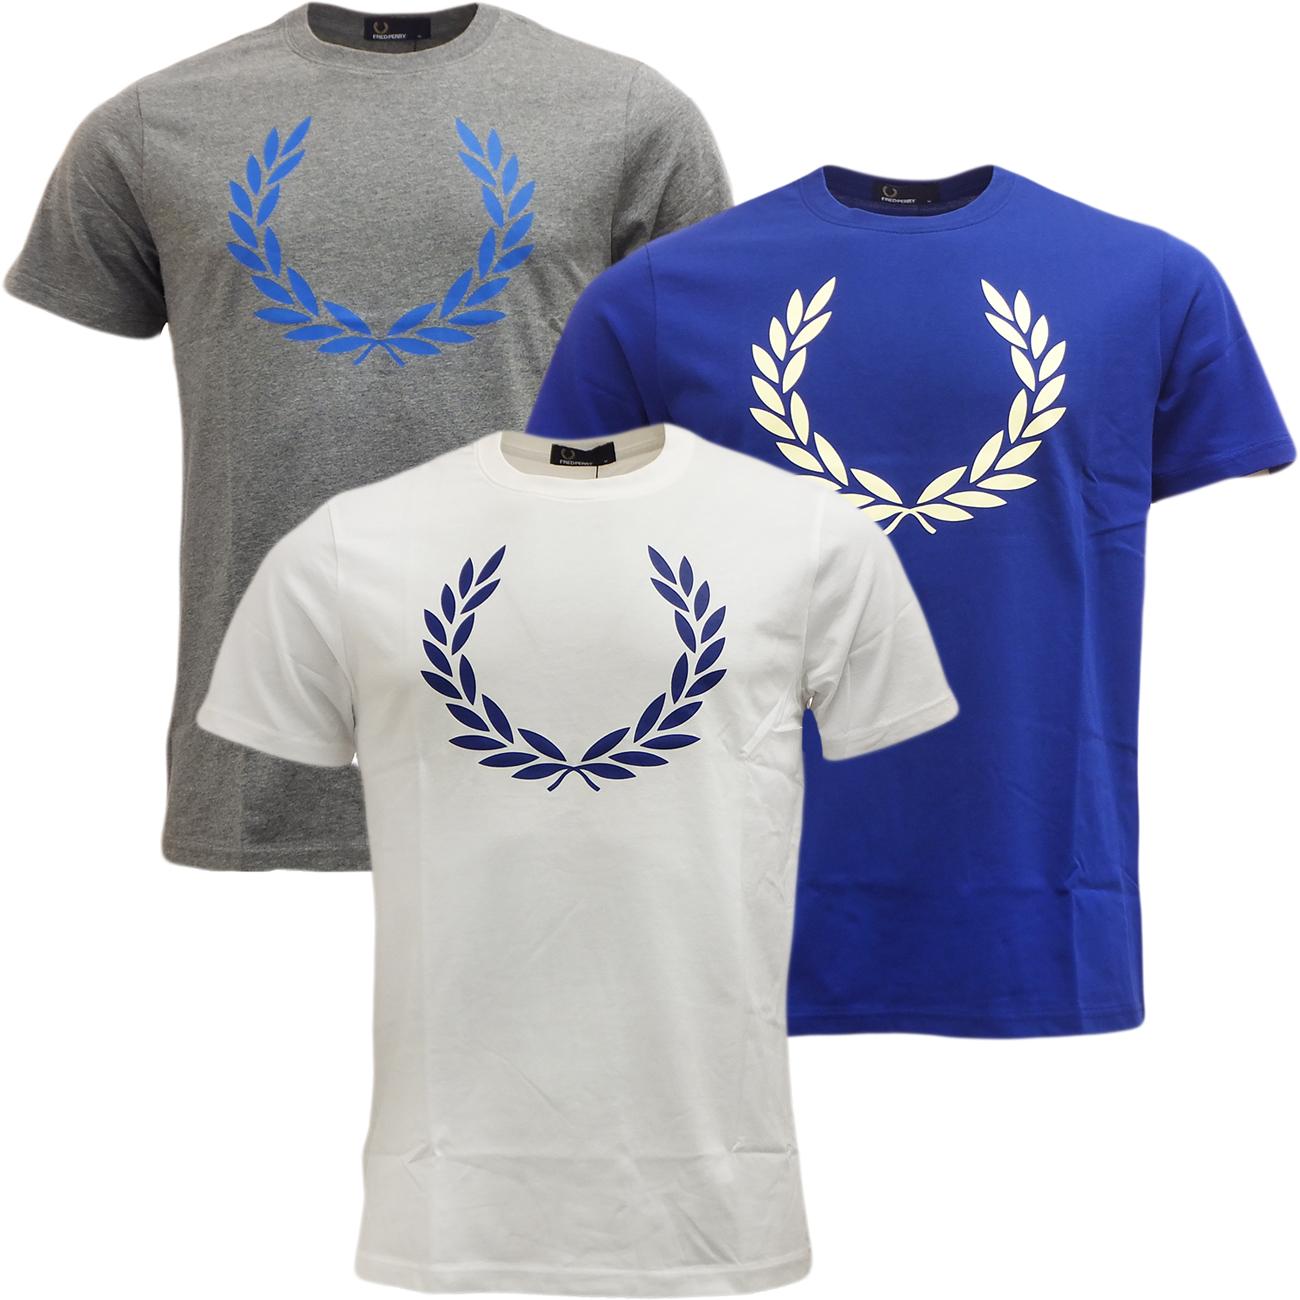 Mens Fred Perry T Shirt Short Sleeve Designer Top Ebay